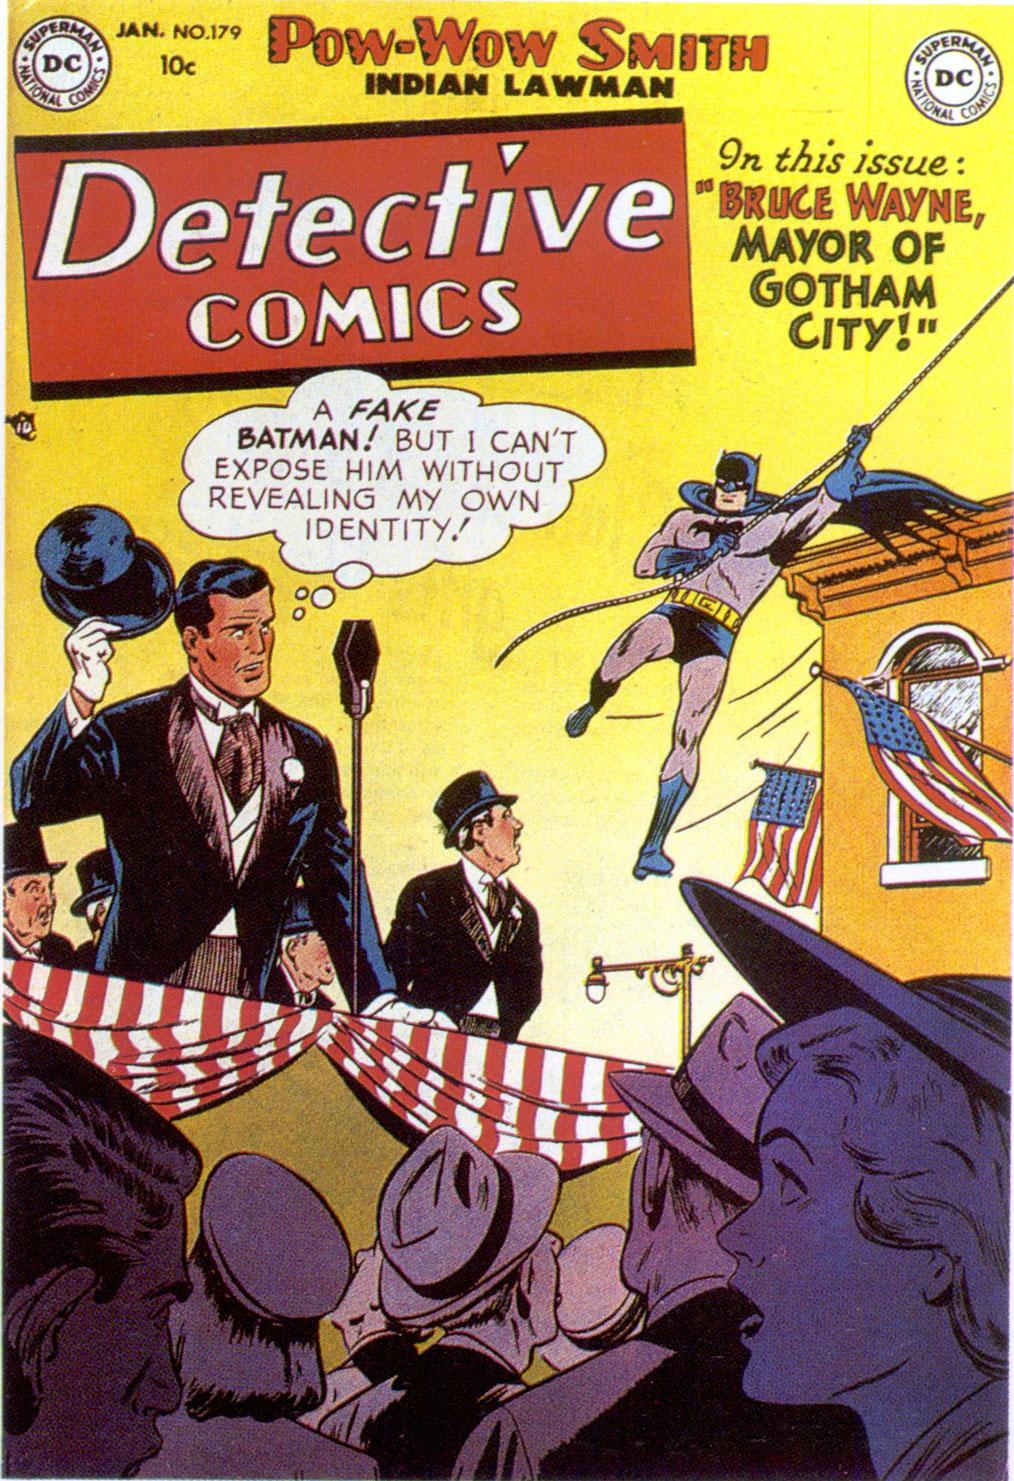 Read online Detective Comics (1937) comic -  Issue #179 - 1